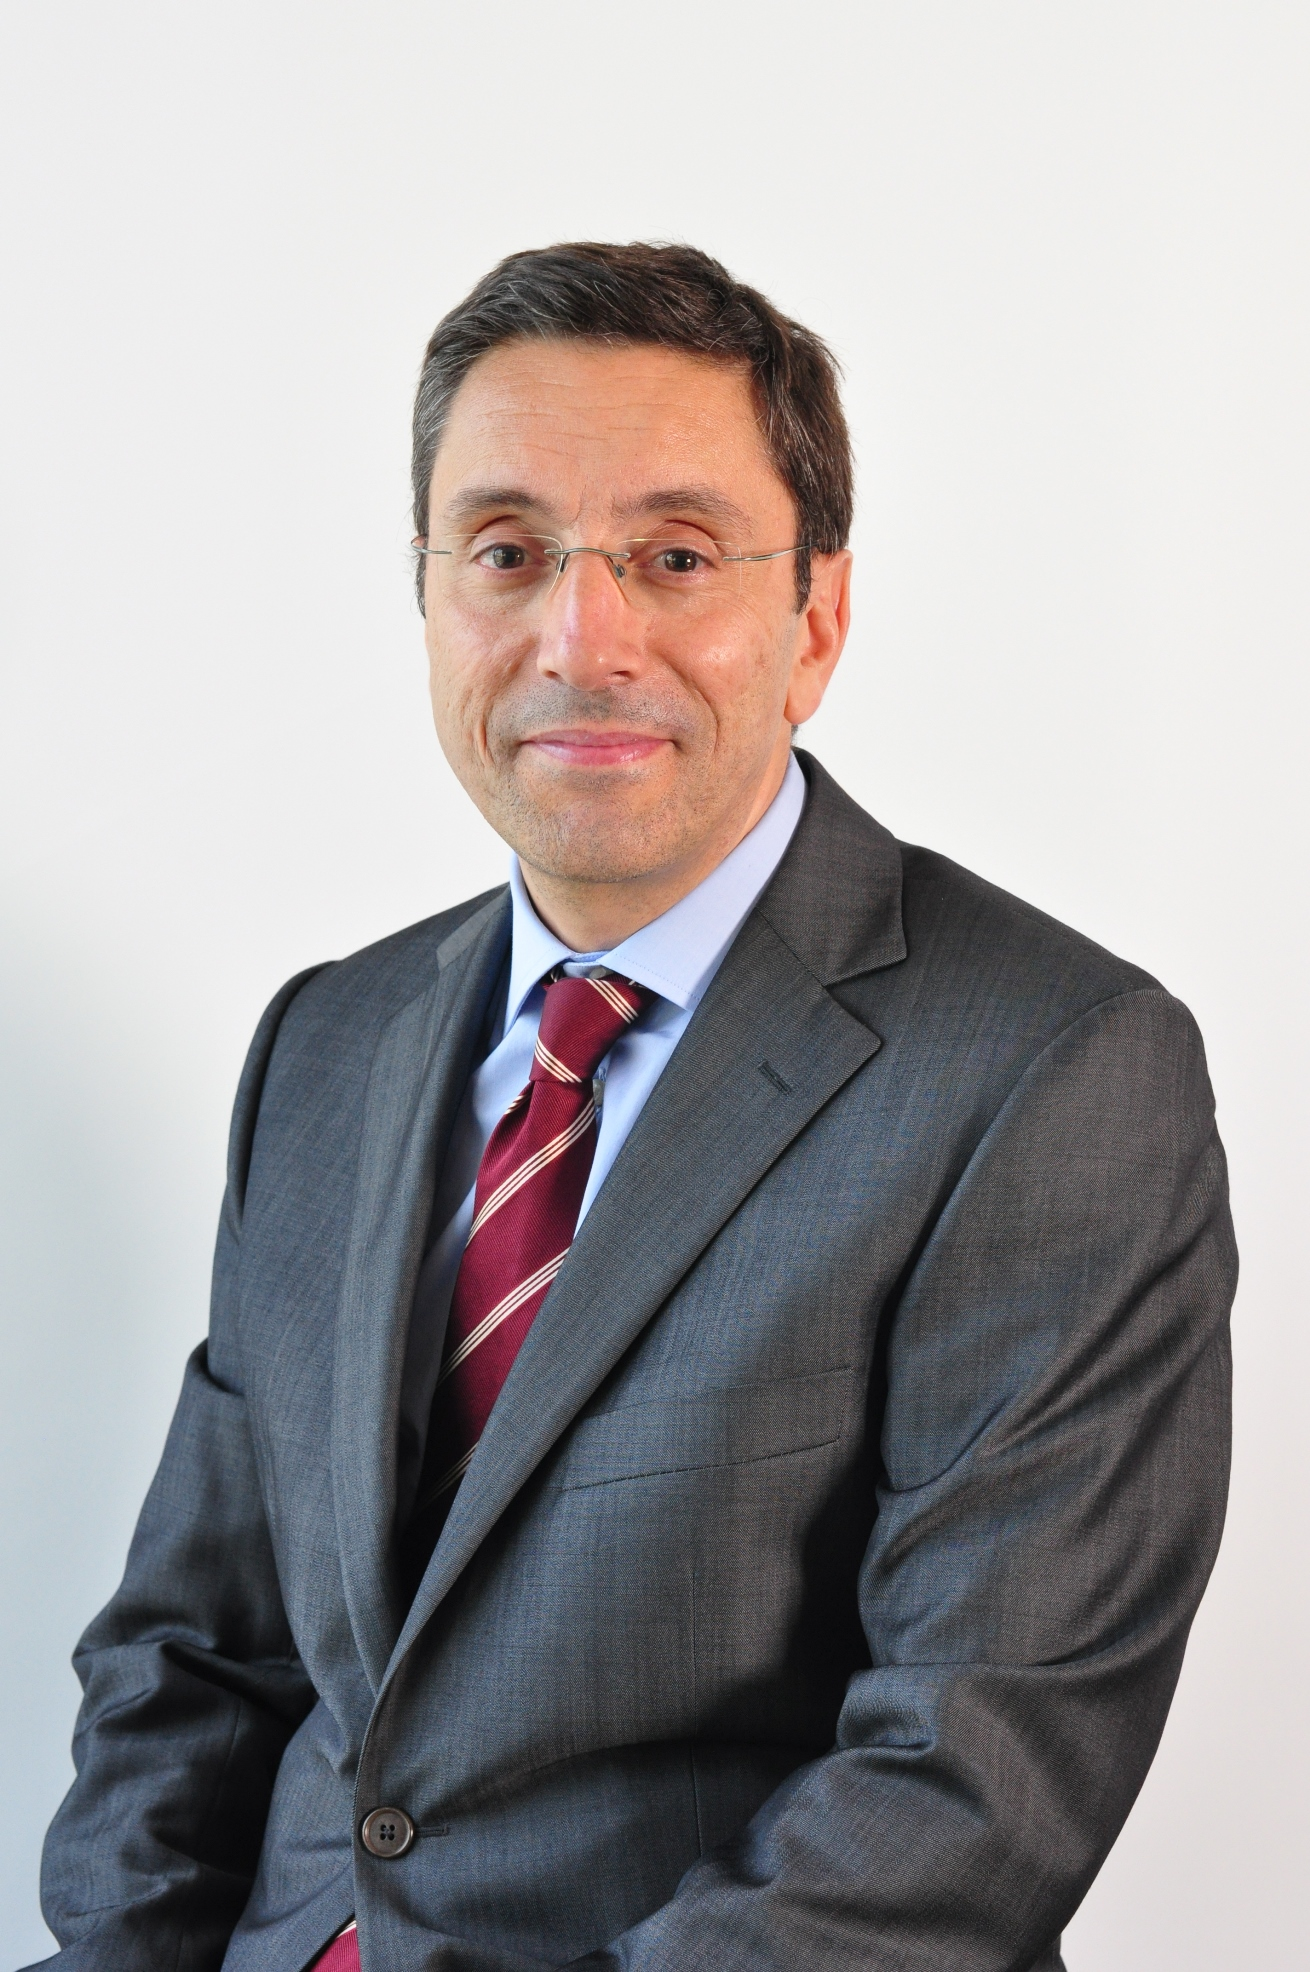 Carlos  Jimenez Borras